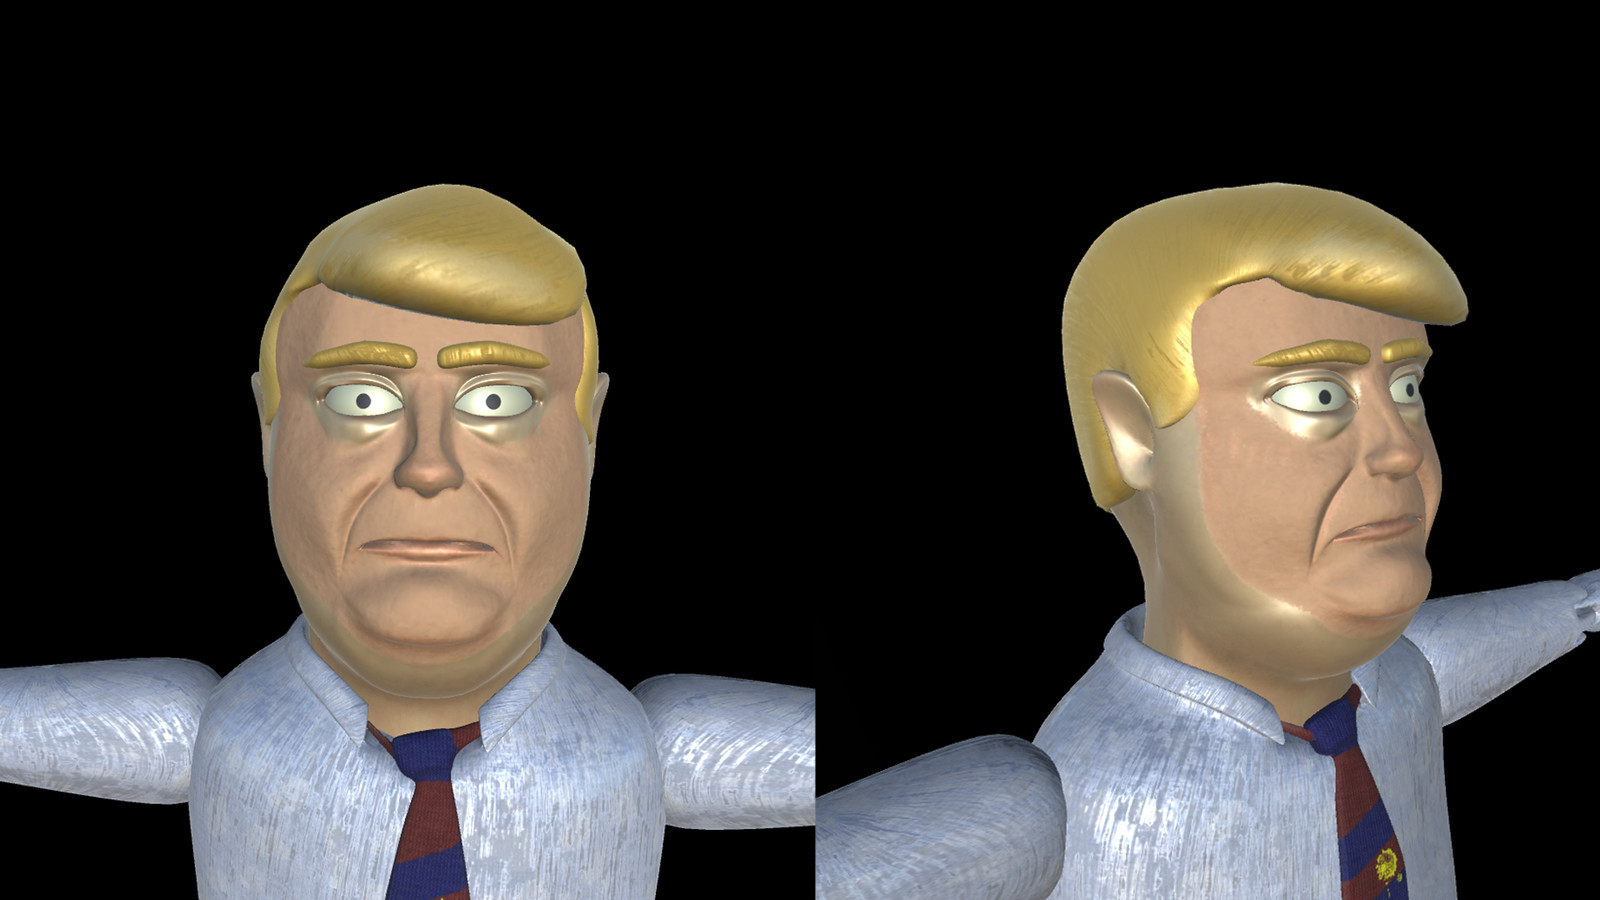 Tramp puppet.